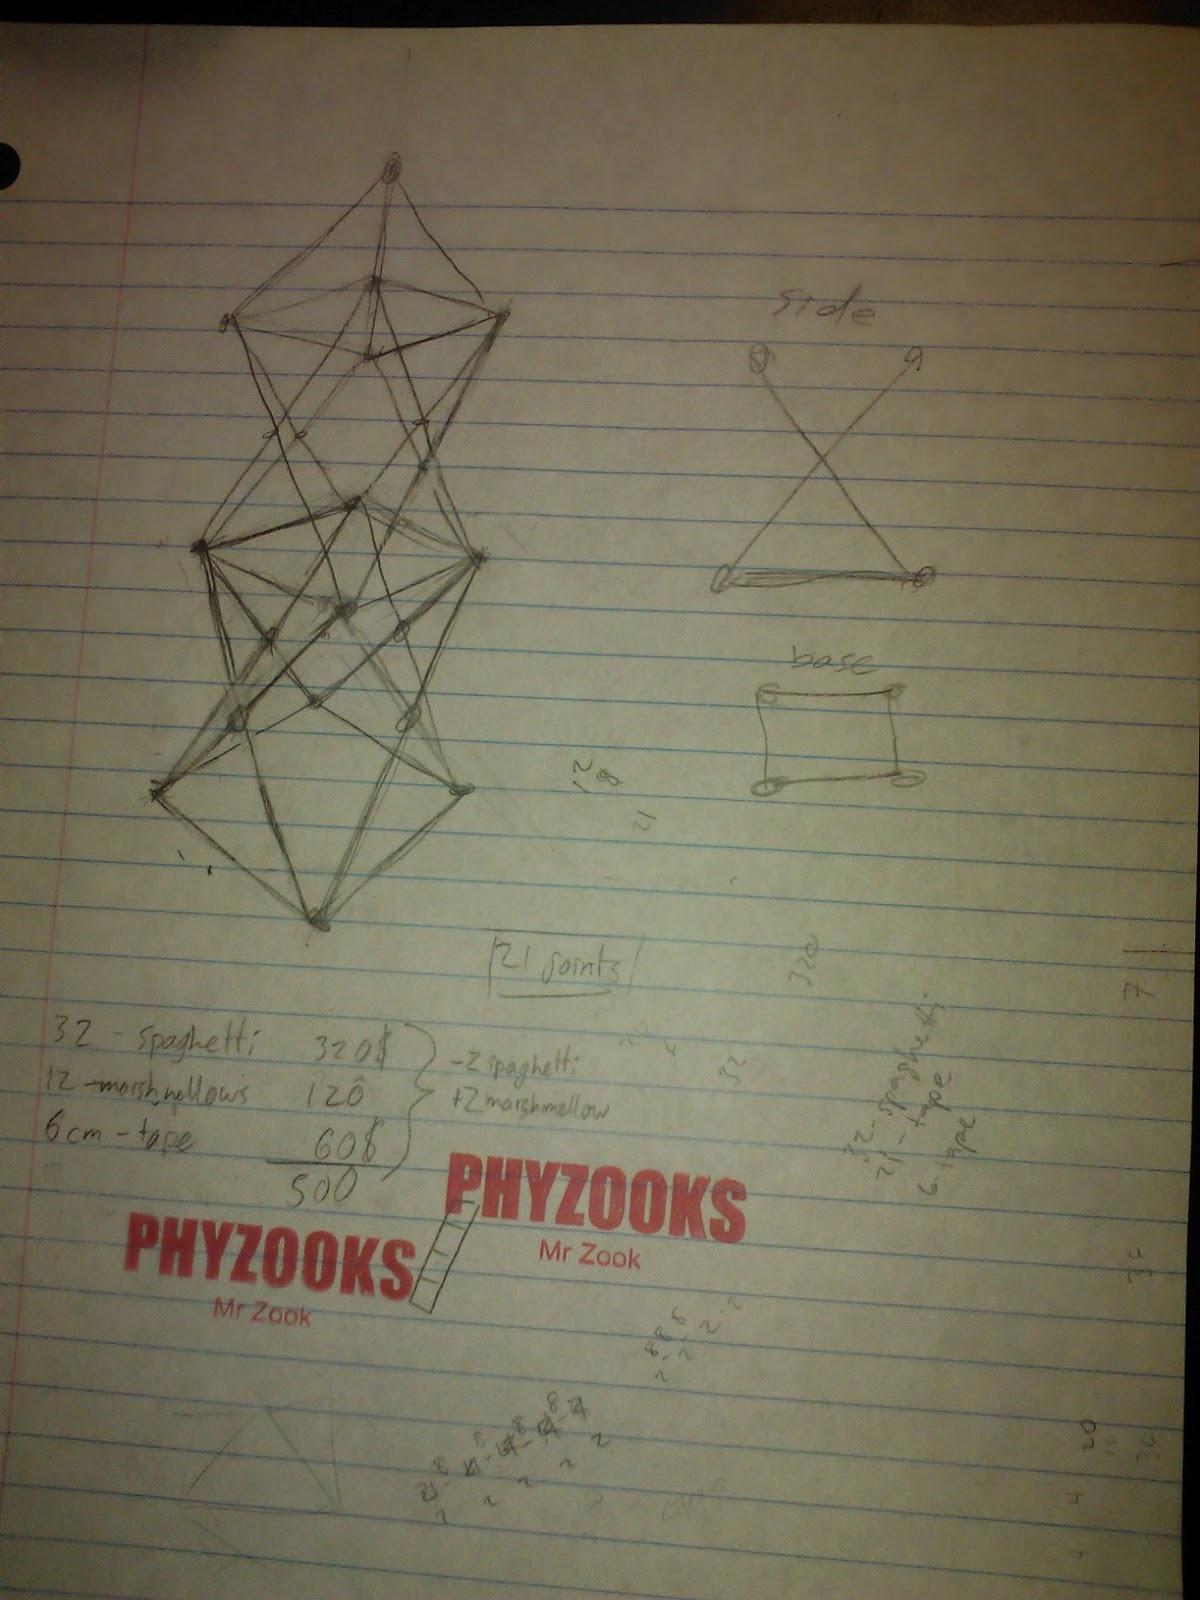 Ap Physics Spaghetti Tower Evaluation Sheets